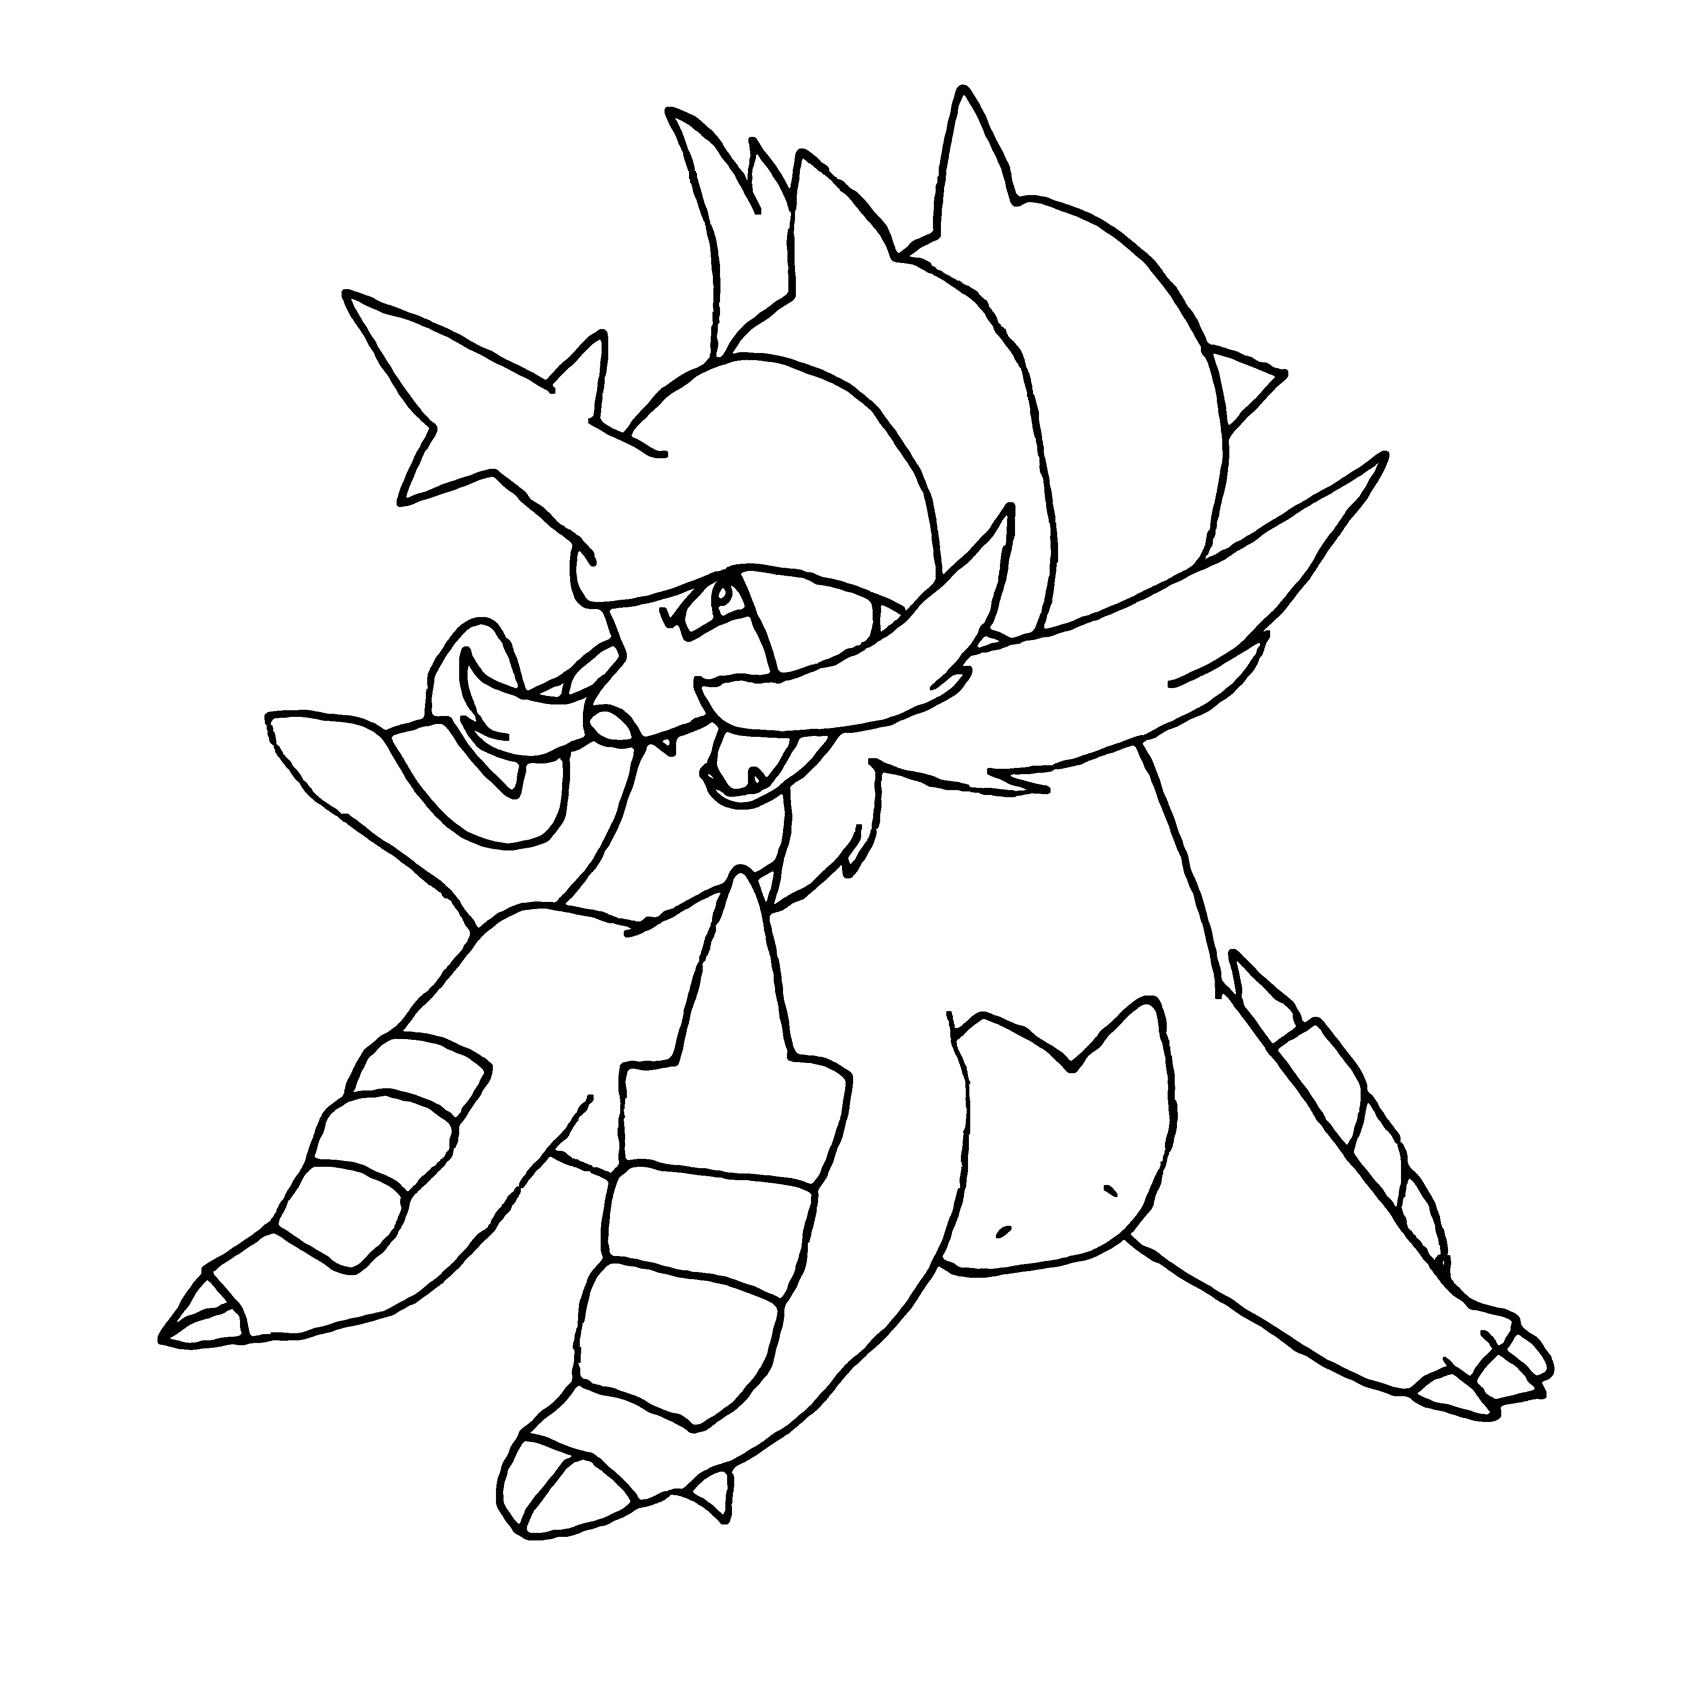 samurott pokemon coloring pages   Samurott by MatthewtheWoodpecker on DeviantArt